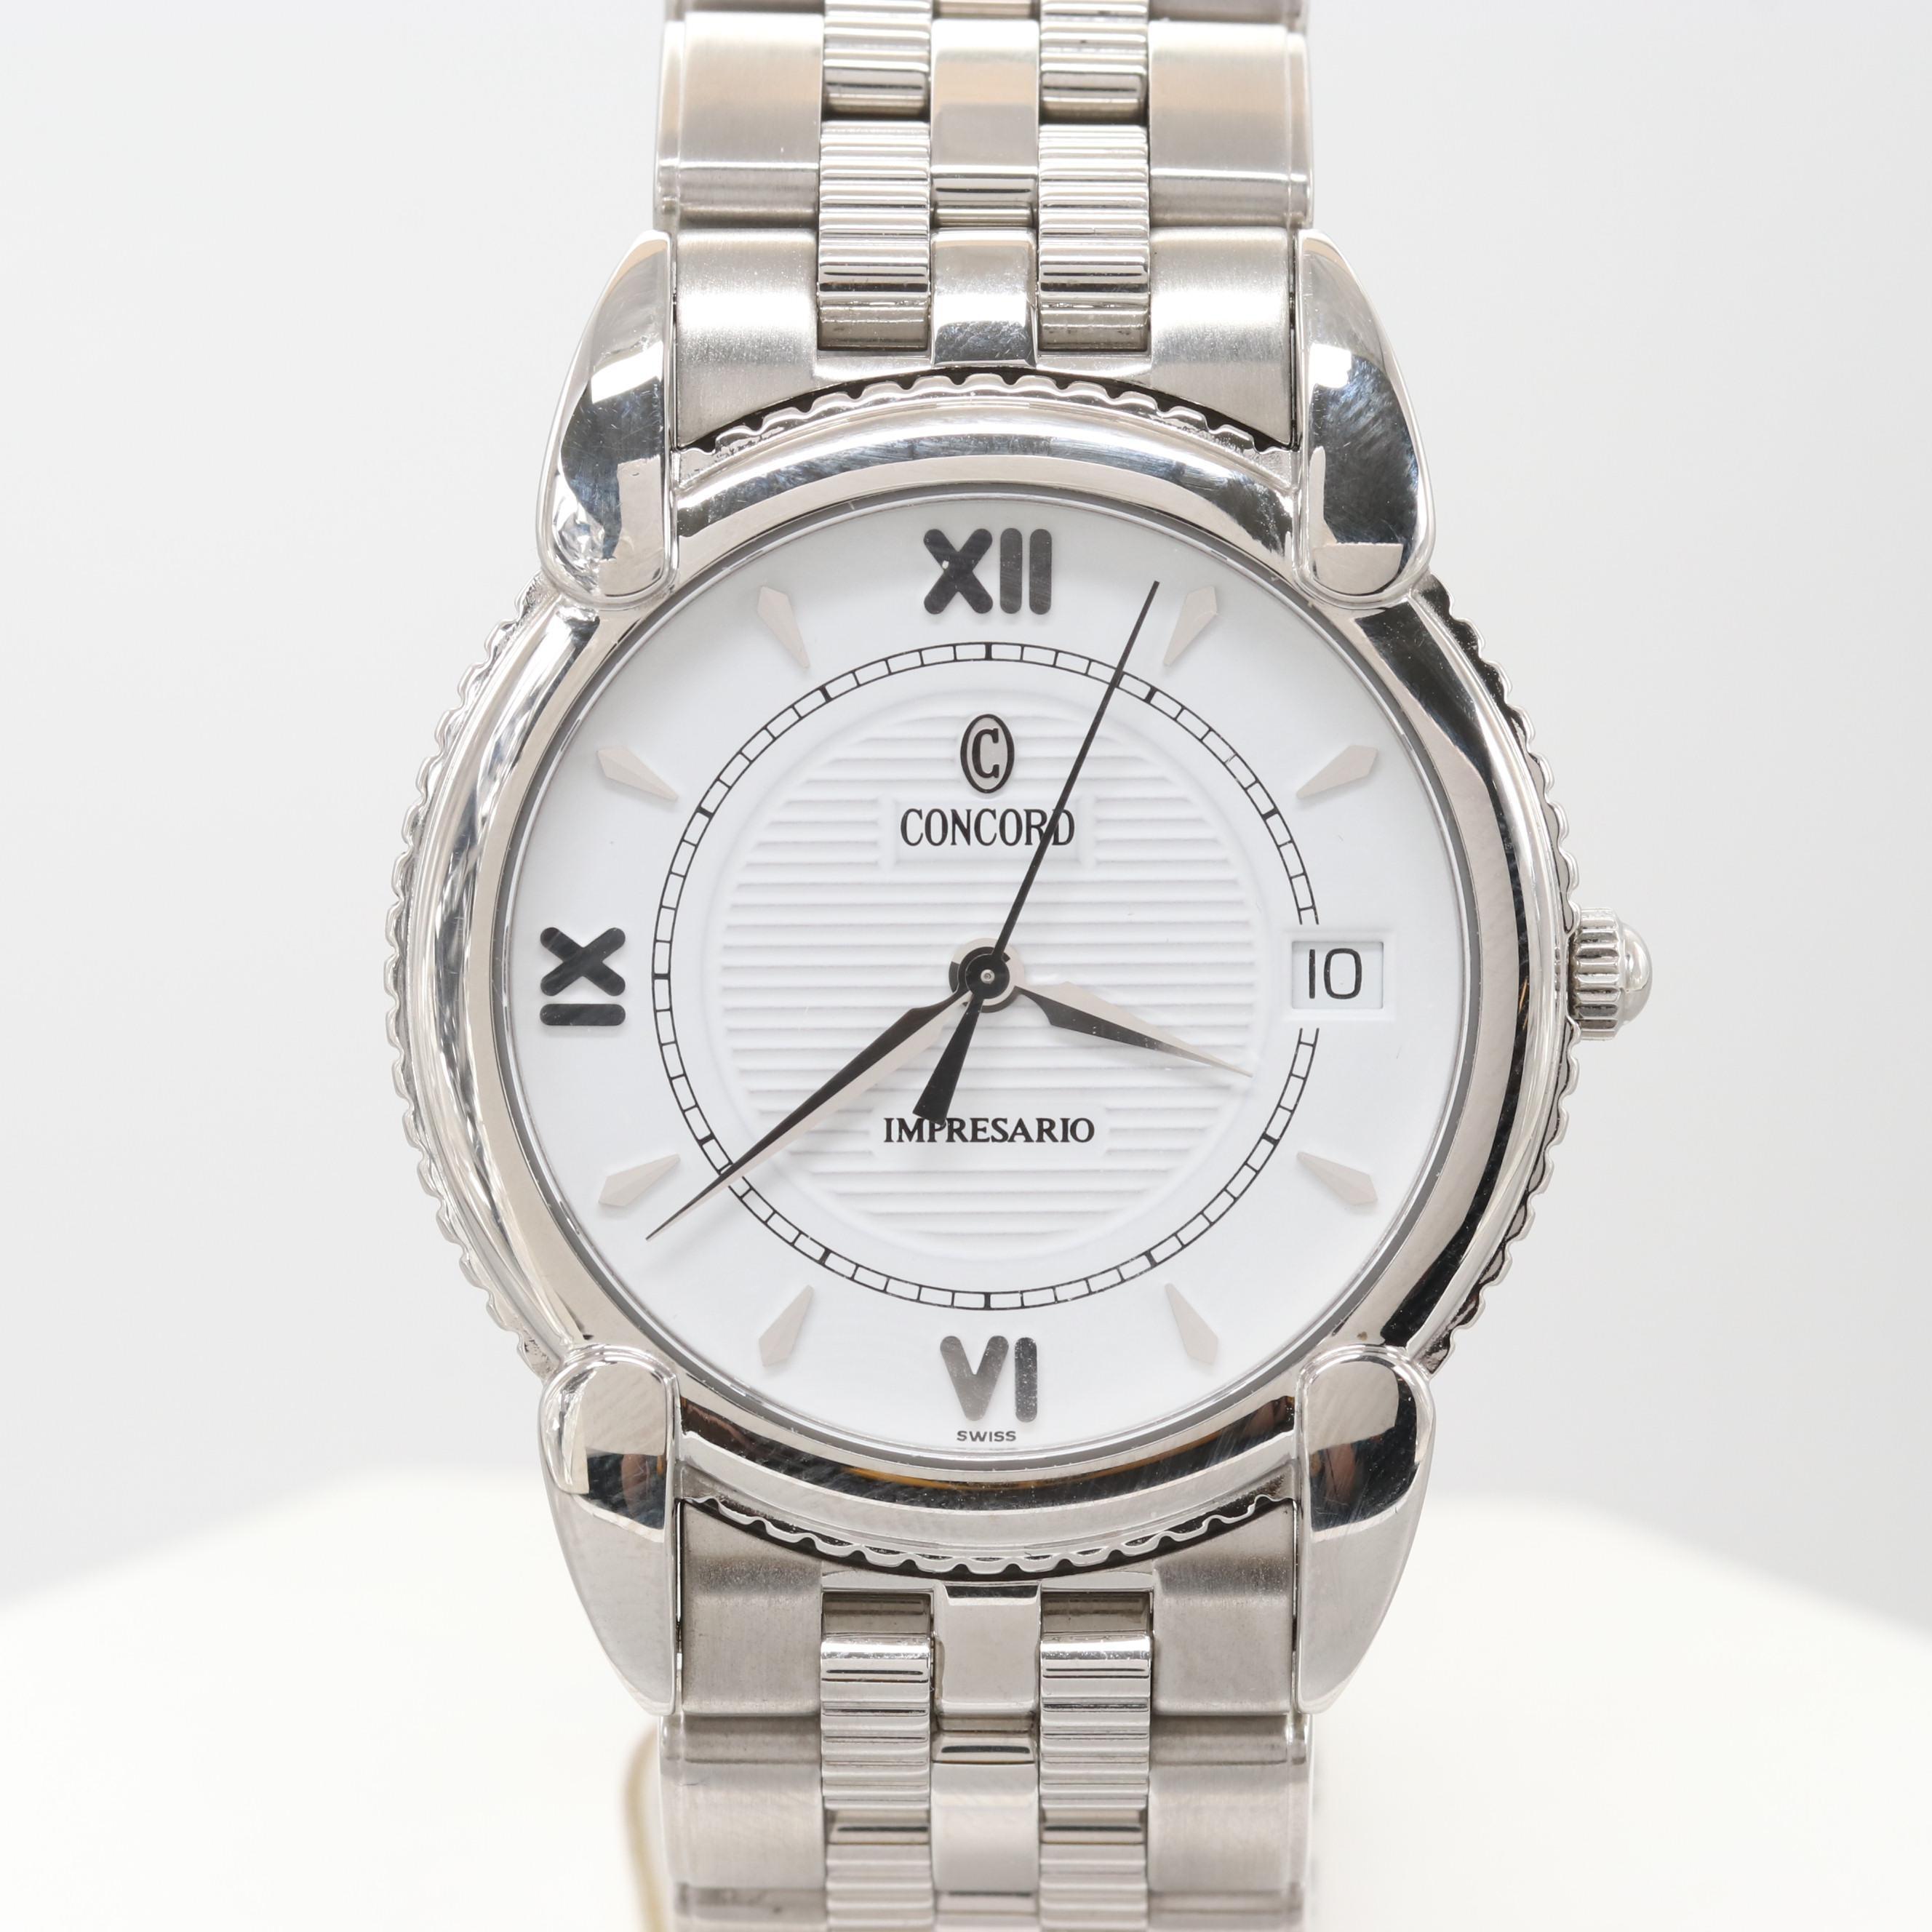 Concord Impressario Stainless Steel Model# 14 C2 212 Wristwatch